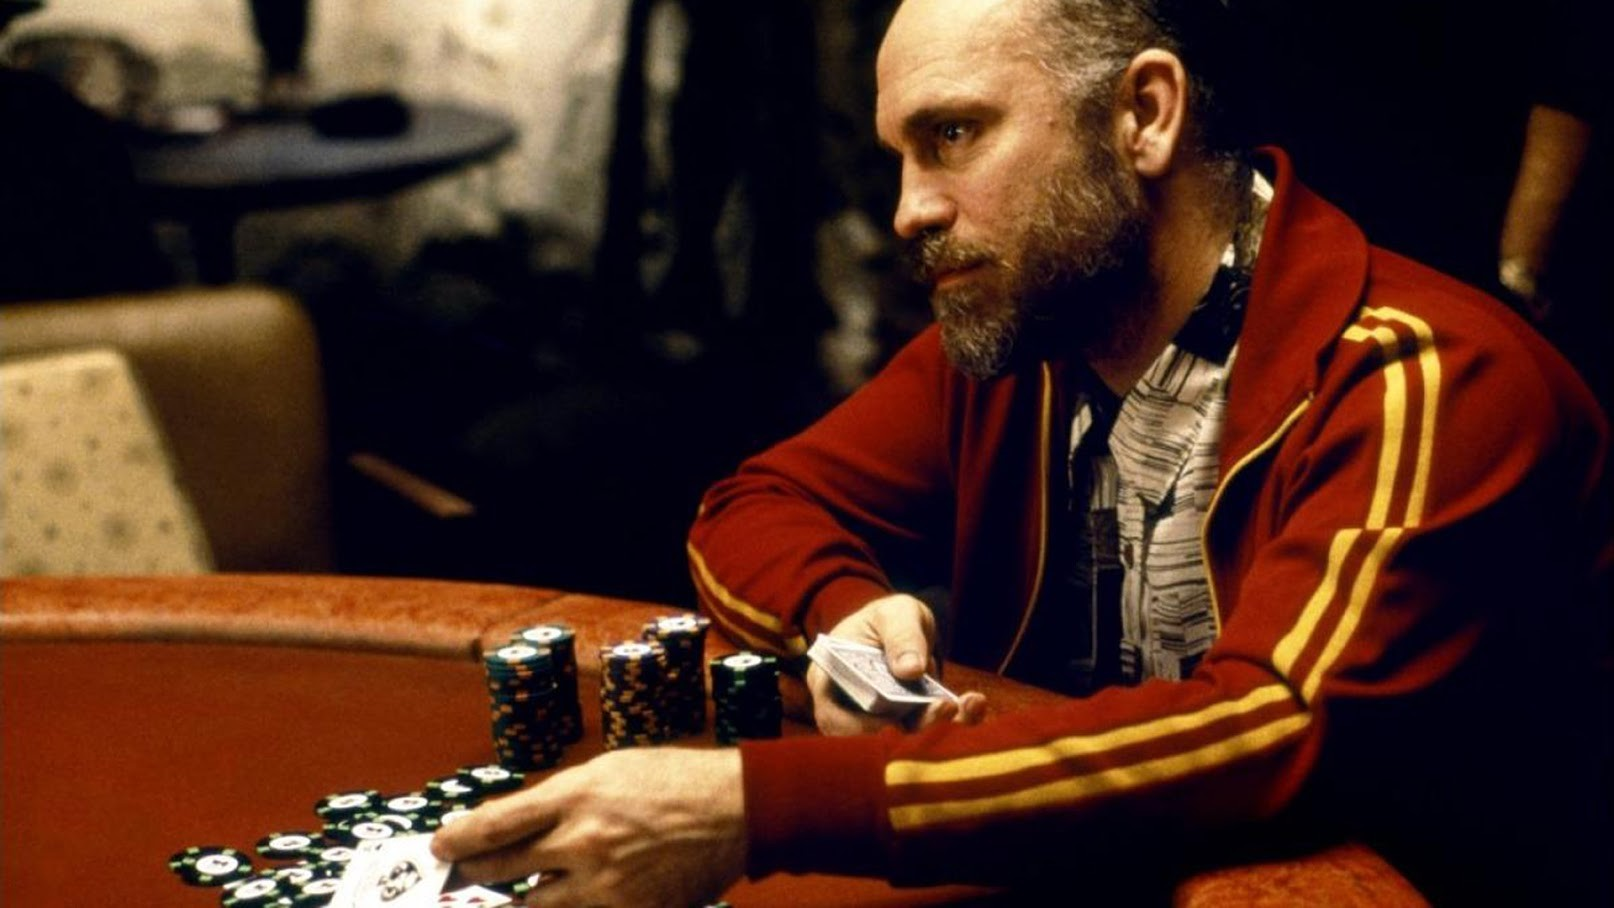 Teddy KGB, Kvartopirci (Rounders, 1998).